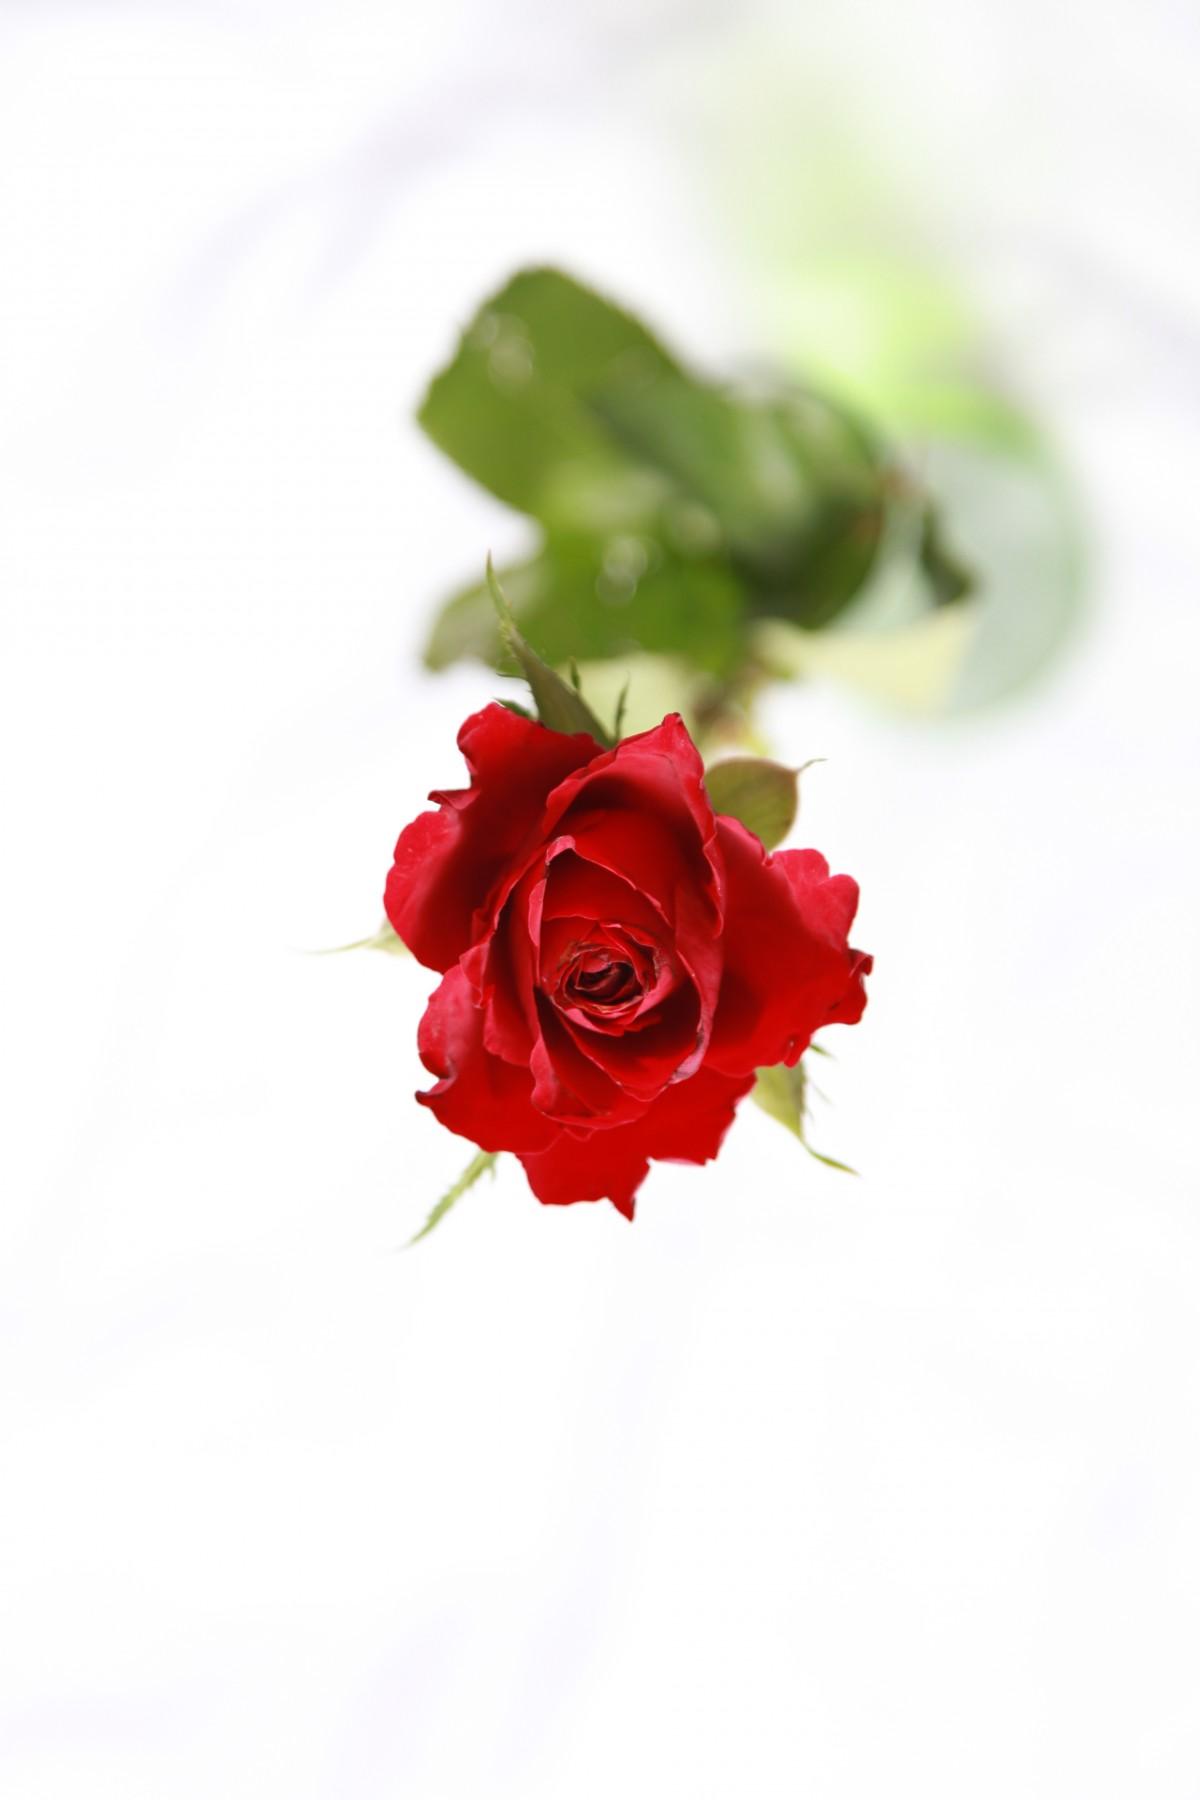 images gratuites fleur p tale rose rouge plante fleurs roses de jardin rose famille. Black Bedroom Furniture Sets. Home Design Ideas